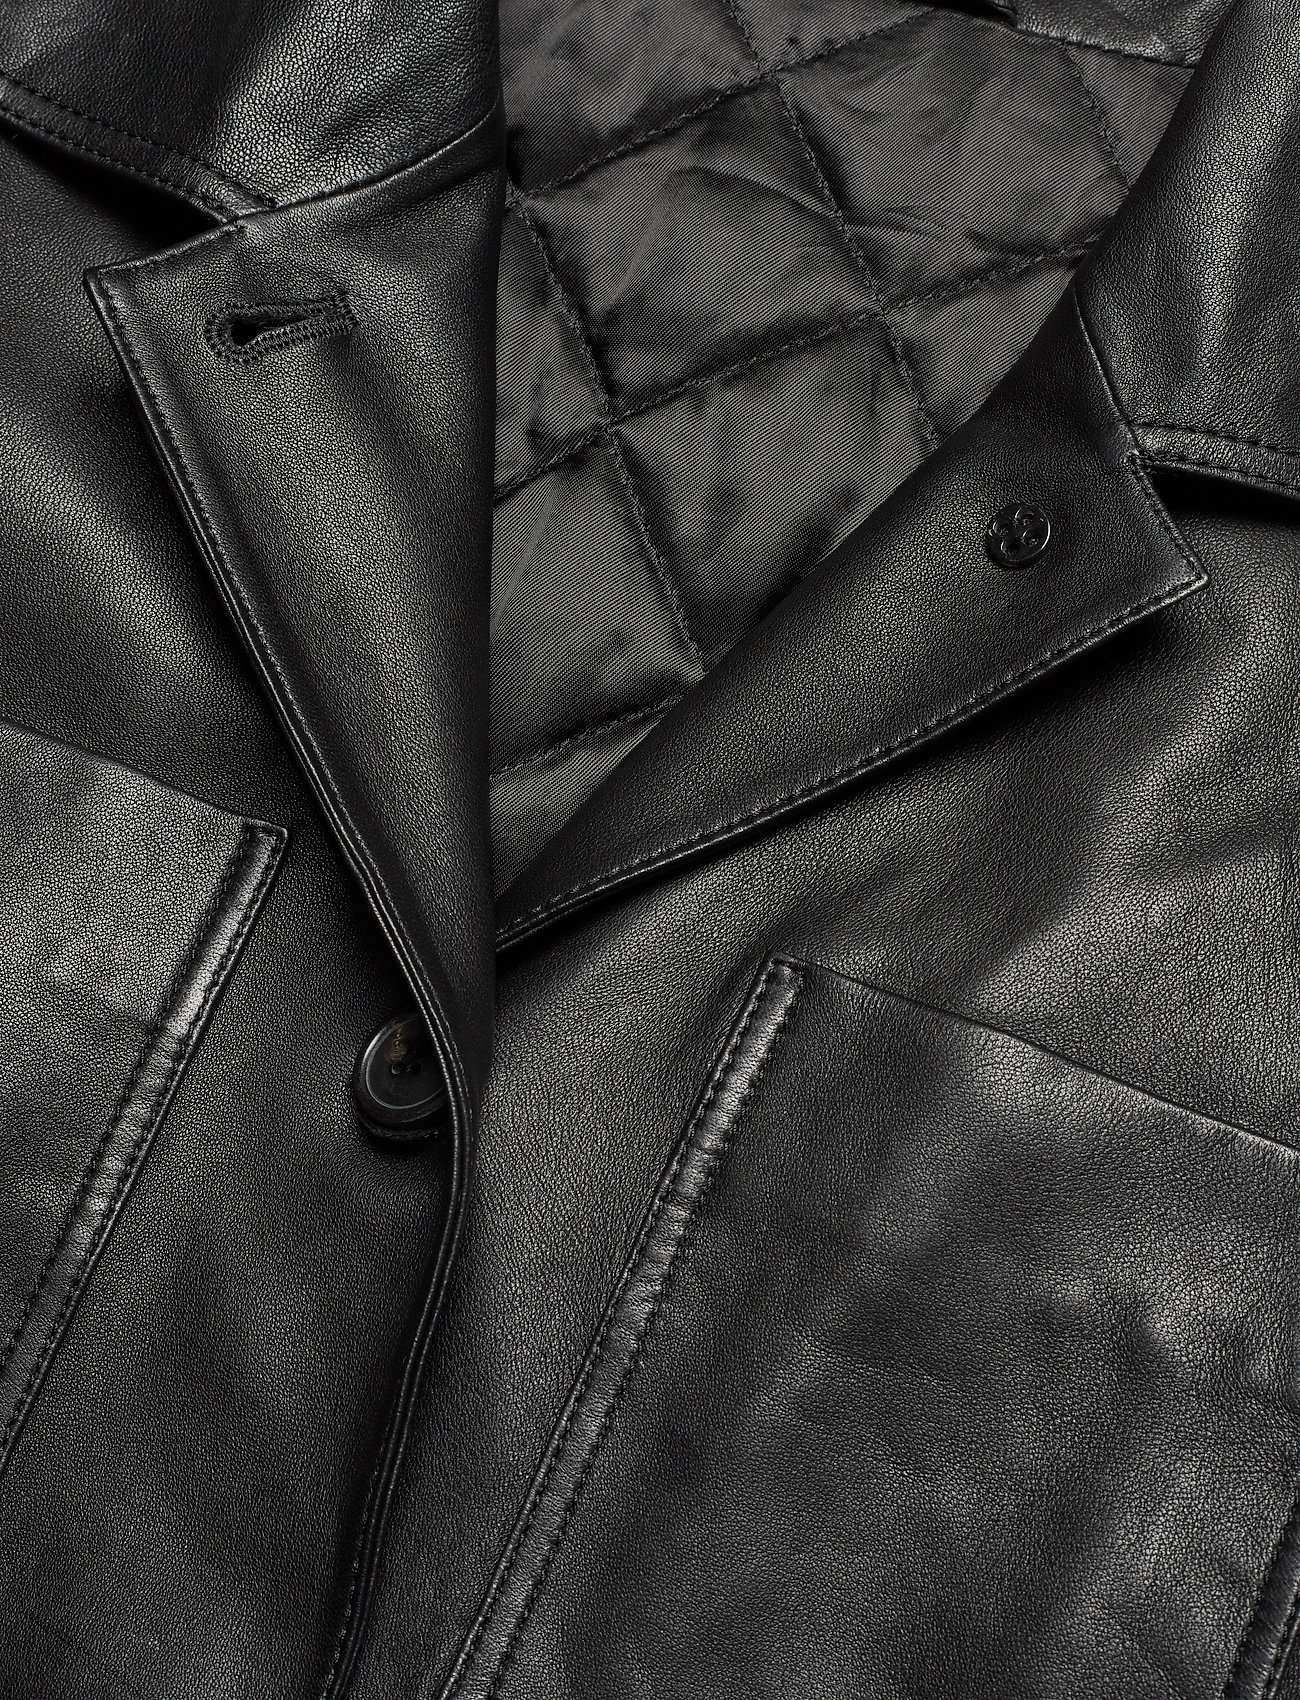 Iris K K JacketblackFilippa Leather K Leather Iris Iris Leather Leather Iris JacketblackFilippa JacketblackFilippa kXuiPOZ